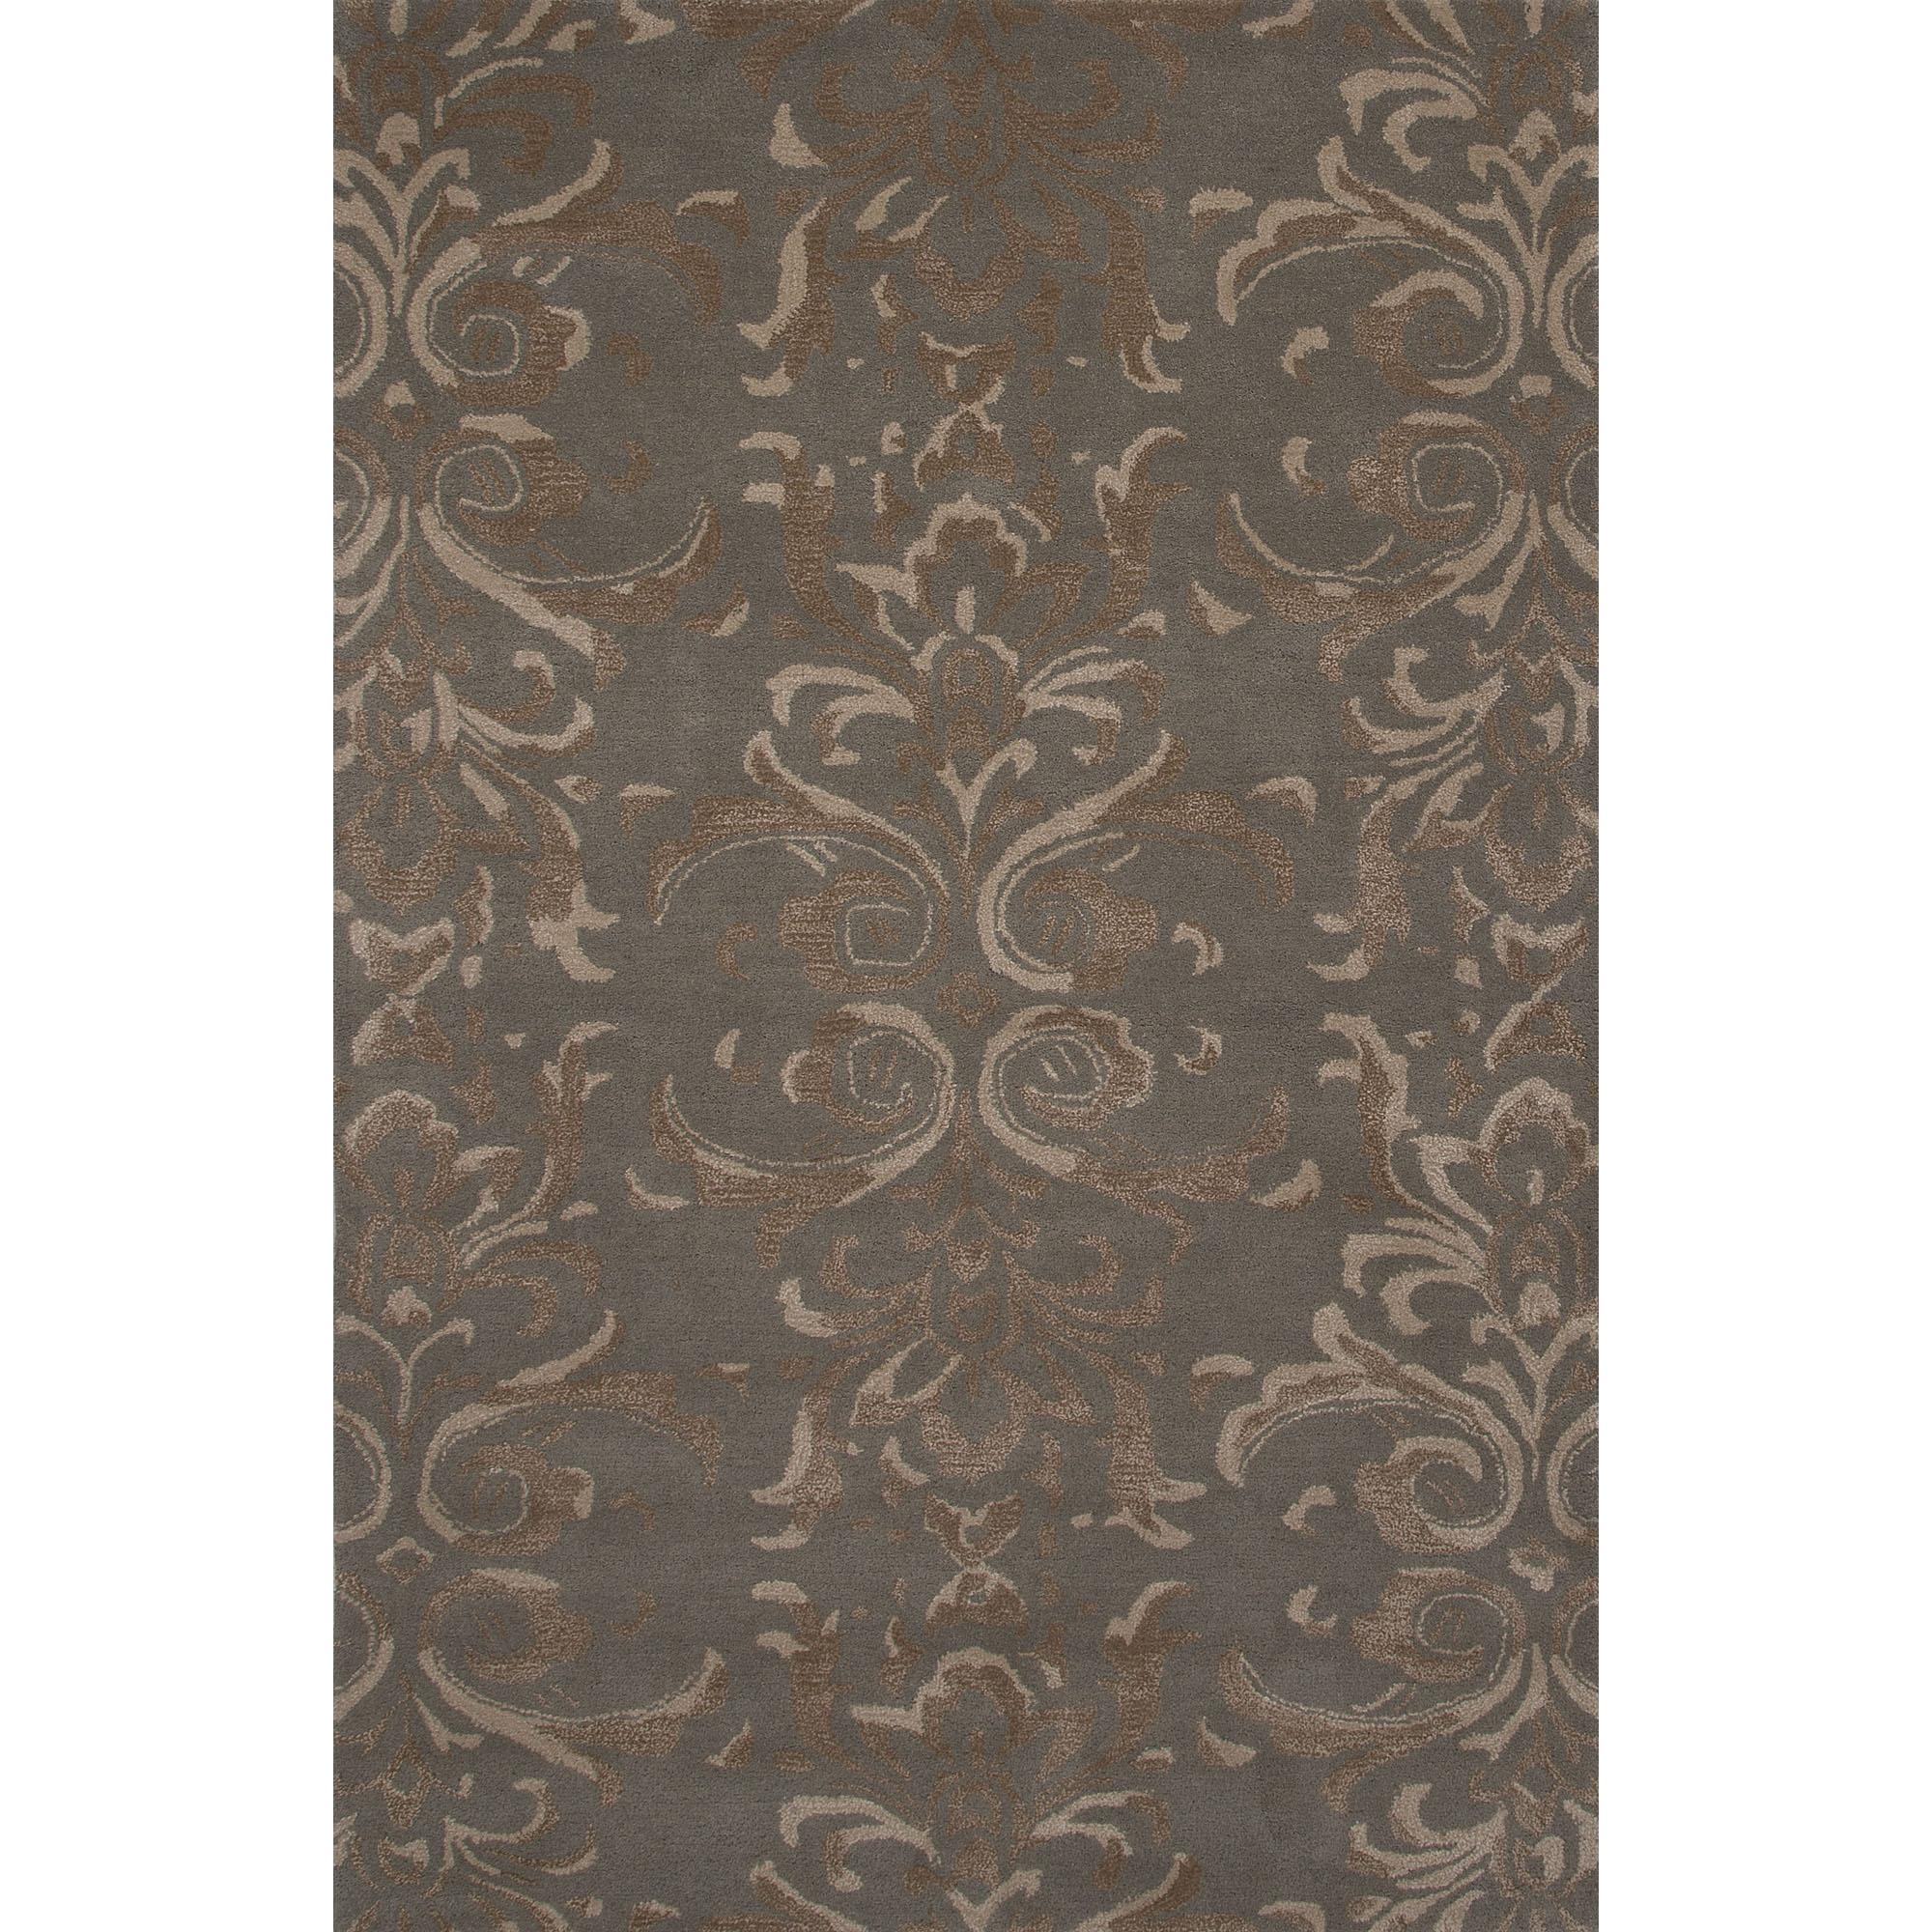 JAIPUR Rugs Timeless By Jennifer Adams Tufted 8 x 11 Rug - Item Number: RUG122176